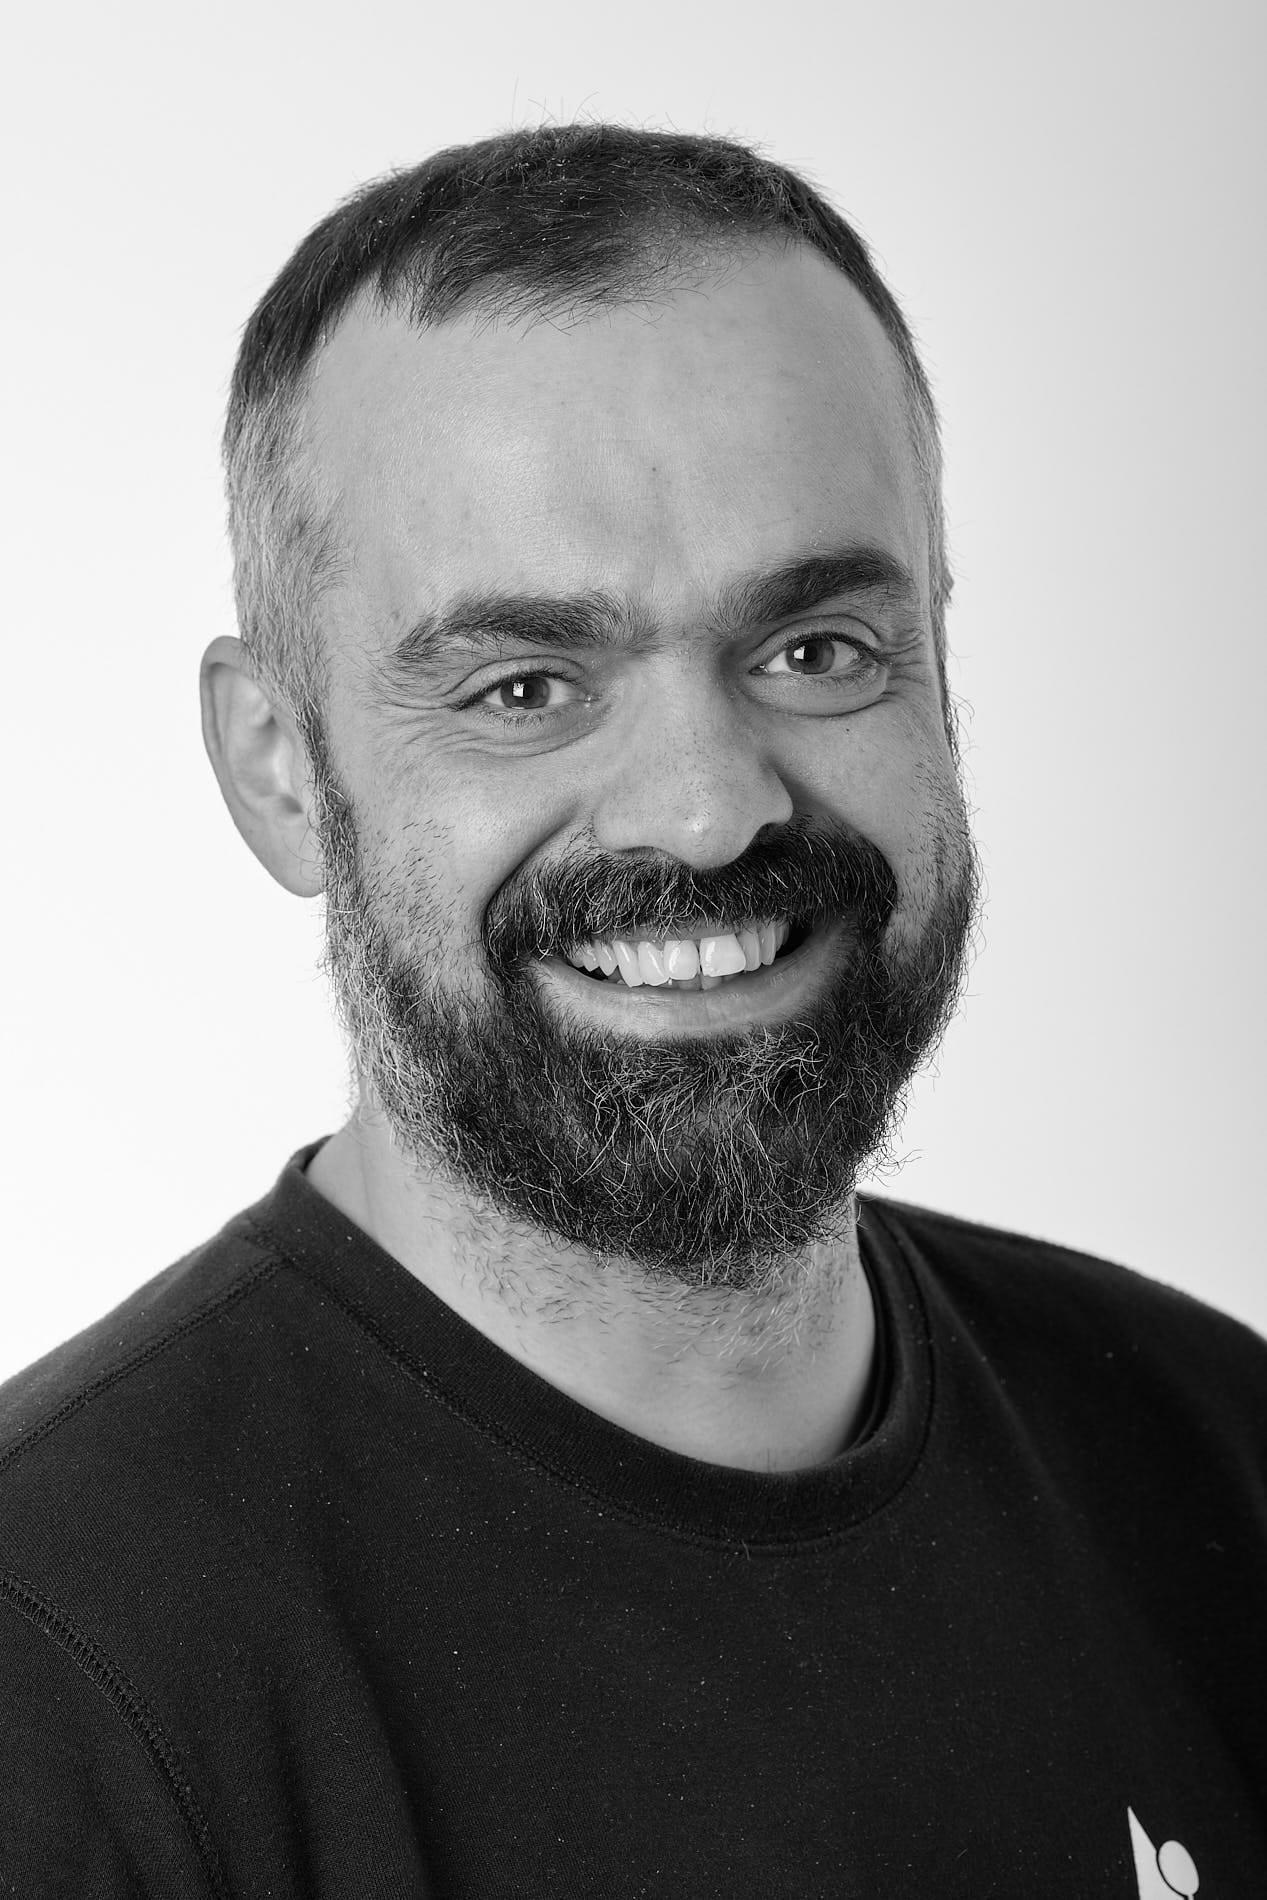 Stefán Björnsson Önundarson